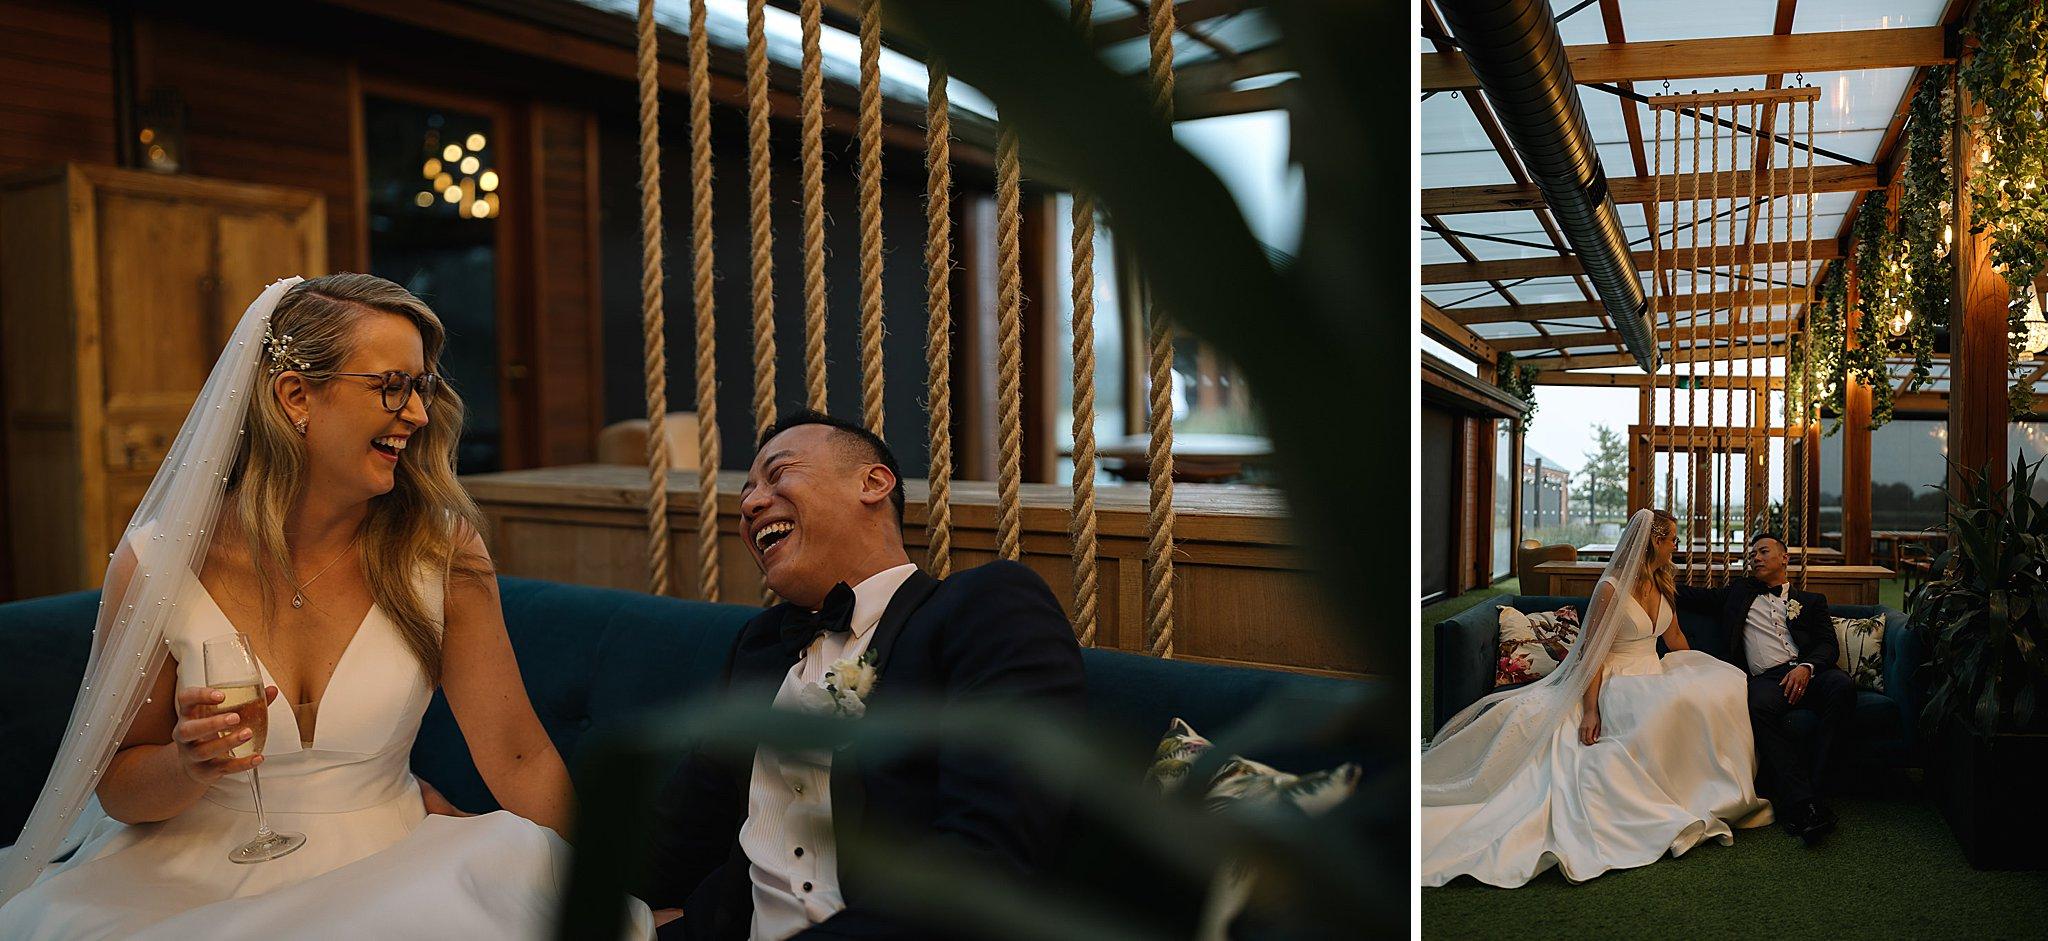 Canberra Photography,Wedding,grace loves grace dress,Keepsakephoto by the Keeffes,ACT wedding photographer,ACT weddings,Bowral Wedding Photographer,canberra wedding,Canberra Wedding Photographer,Canberra Wedding Photography,destination wedding,Pialligo Estate,Pialligo Estate wedding,Wedding Inspiration,Summer wedding,vibe hotel,